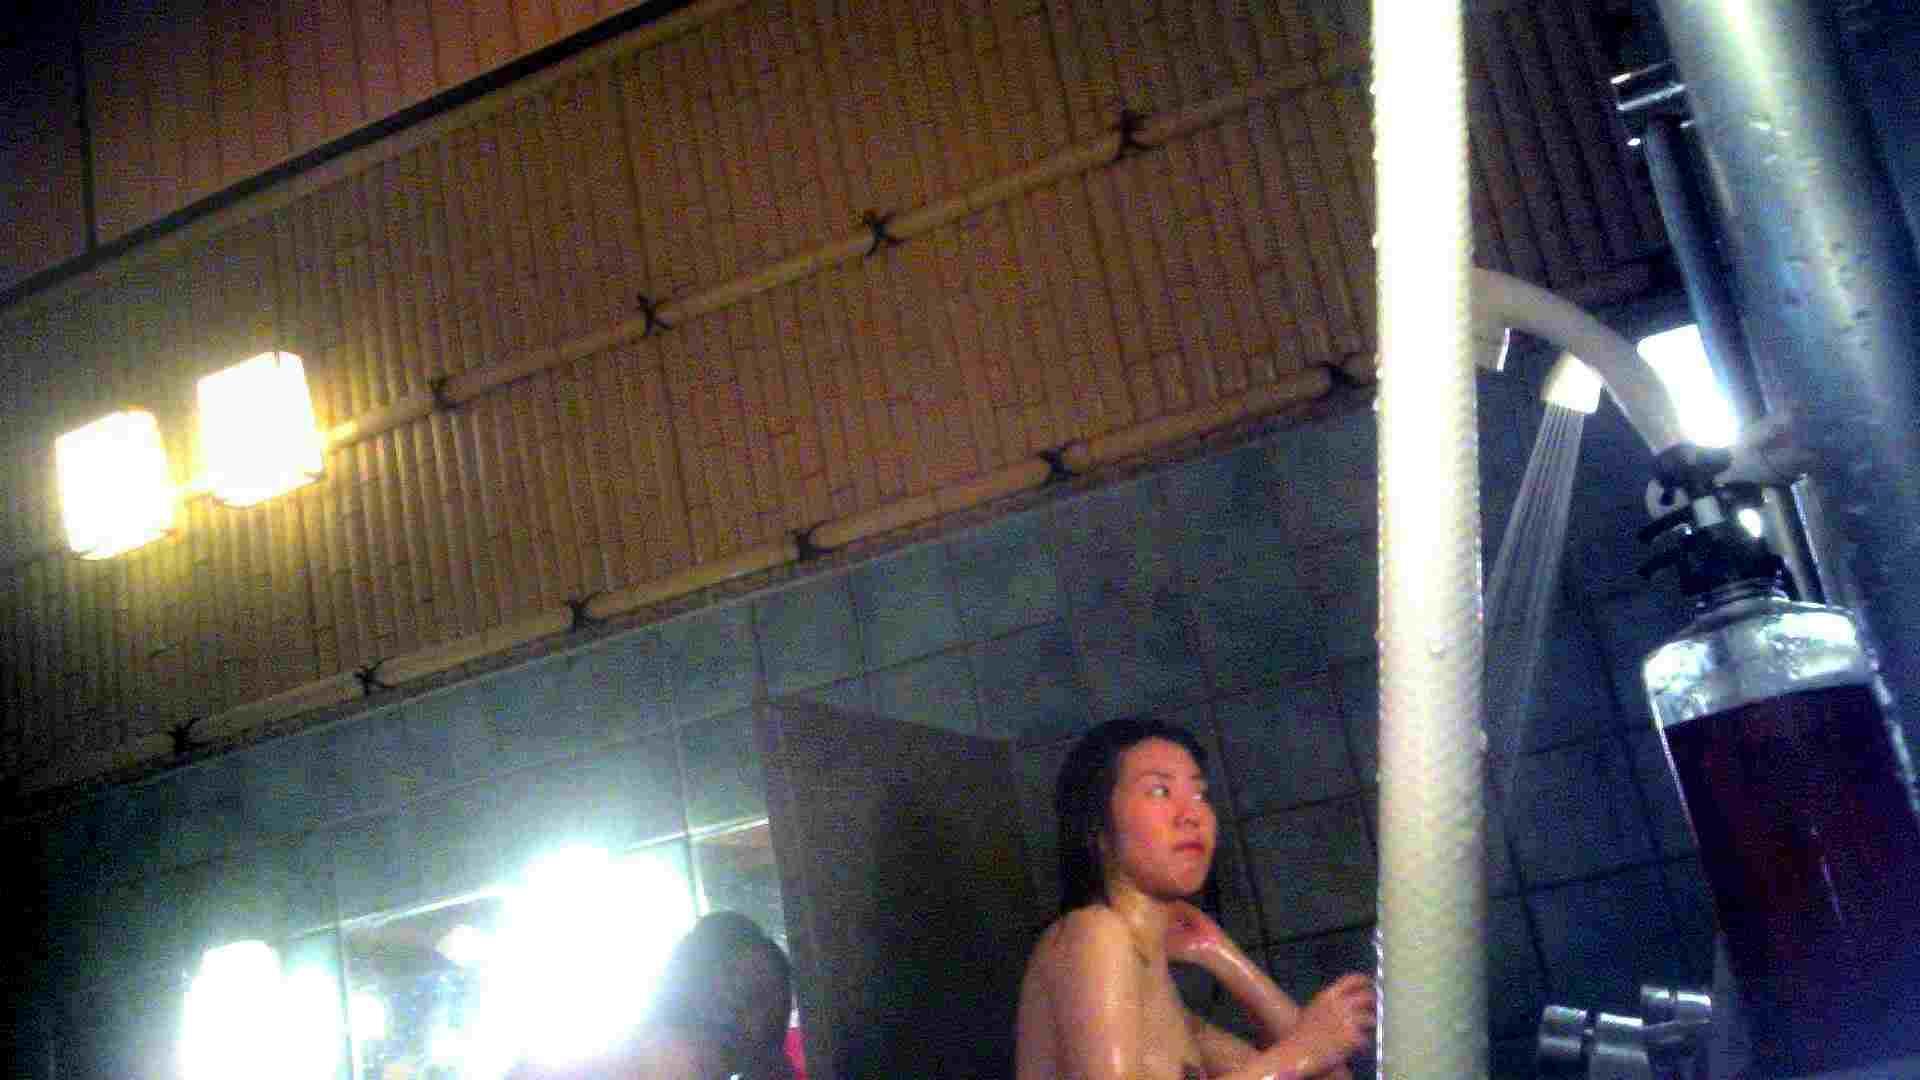 TG.29 【一等兵】同じ女性でも多種多様だなぁと感じる作品 女湯のぞき オメコ動画キャプチャ 80枚 60